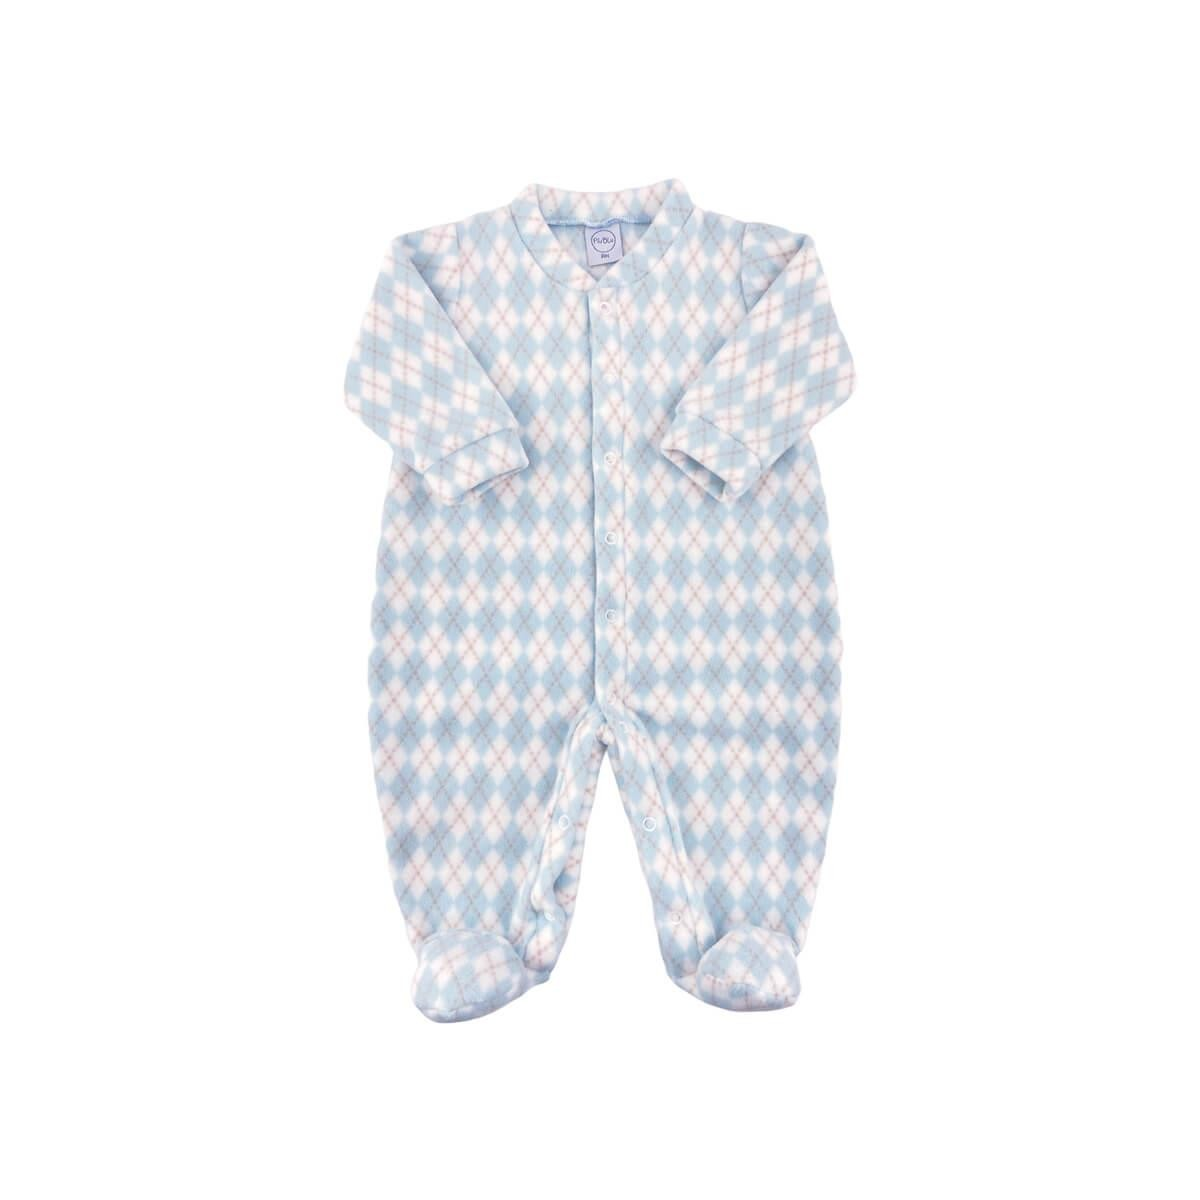 Macacão Soft Xadrez Azul Bebê Soft  - Piu Blu